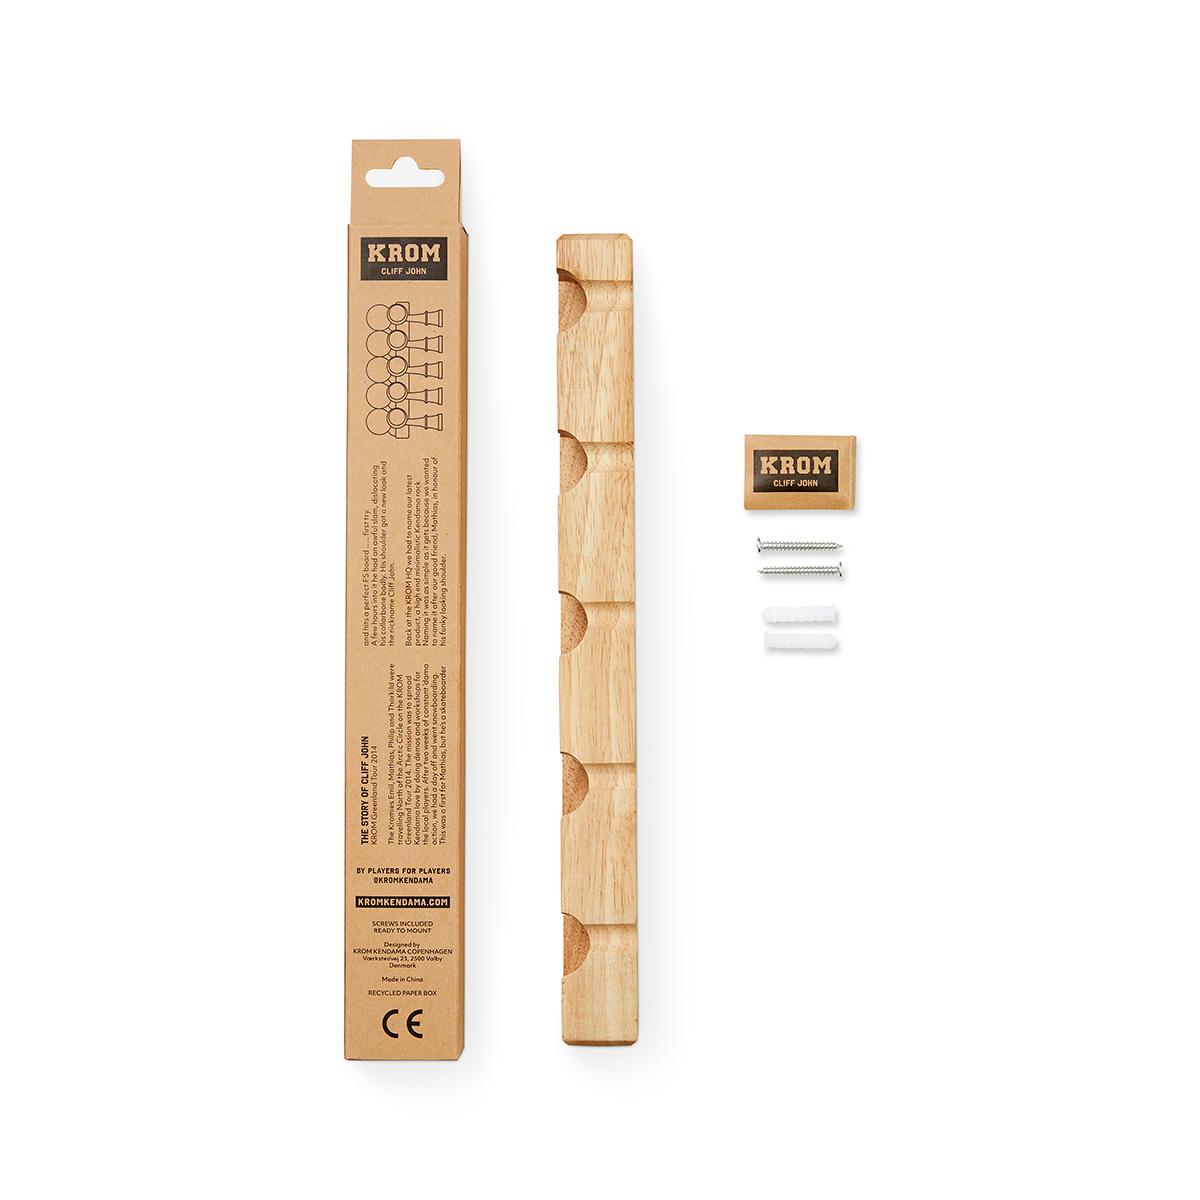 KROM けん玉ラック -CLIFF JOHN 2.0- Rubber Wood(ラバーウッド)製